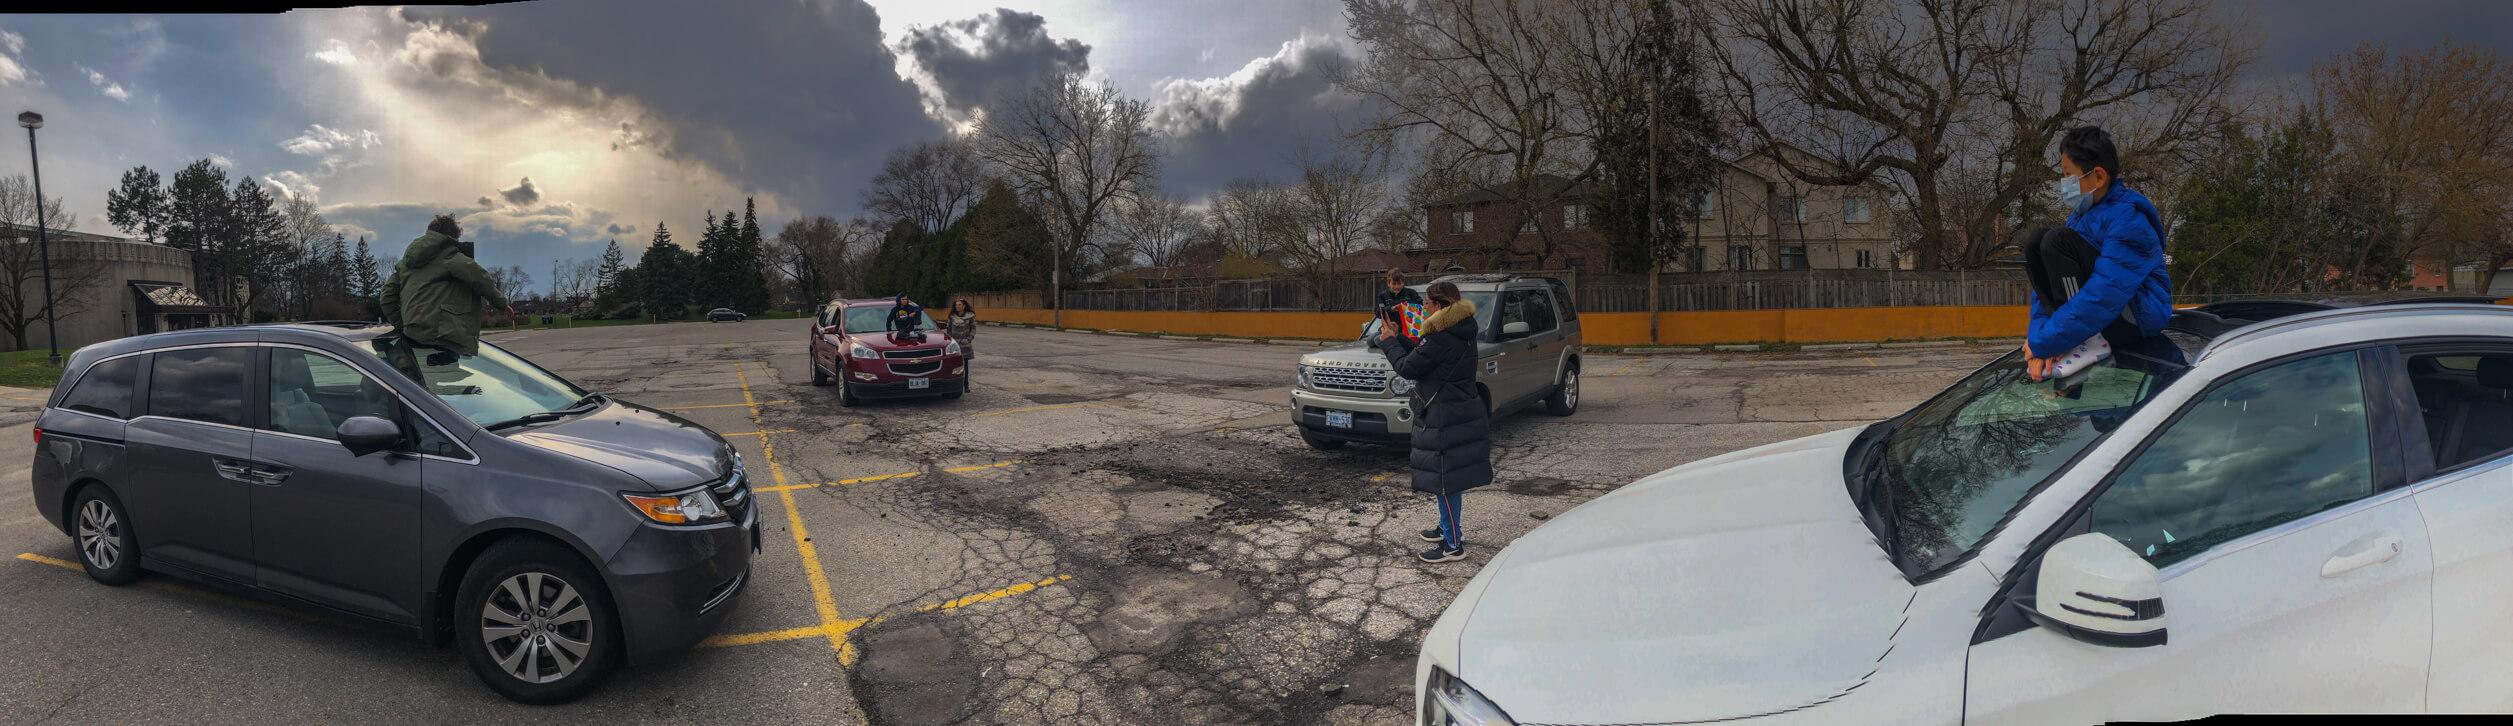 birthday parking lot